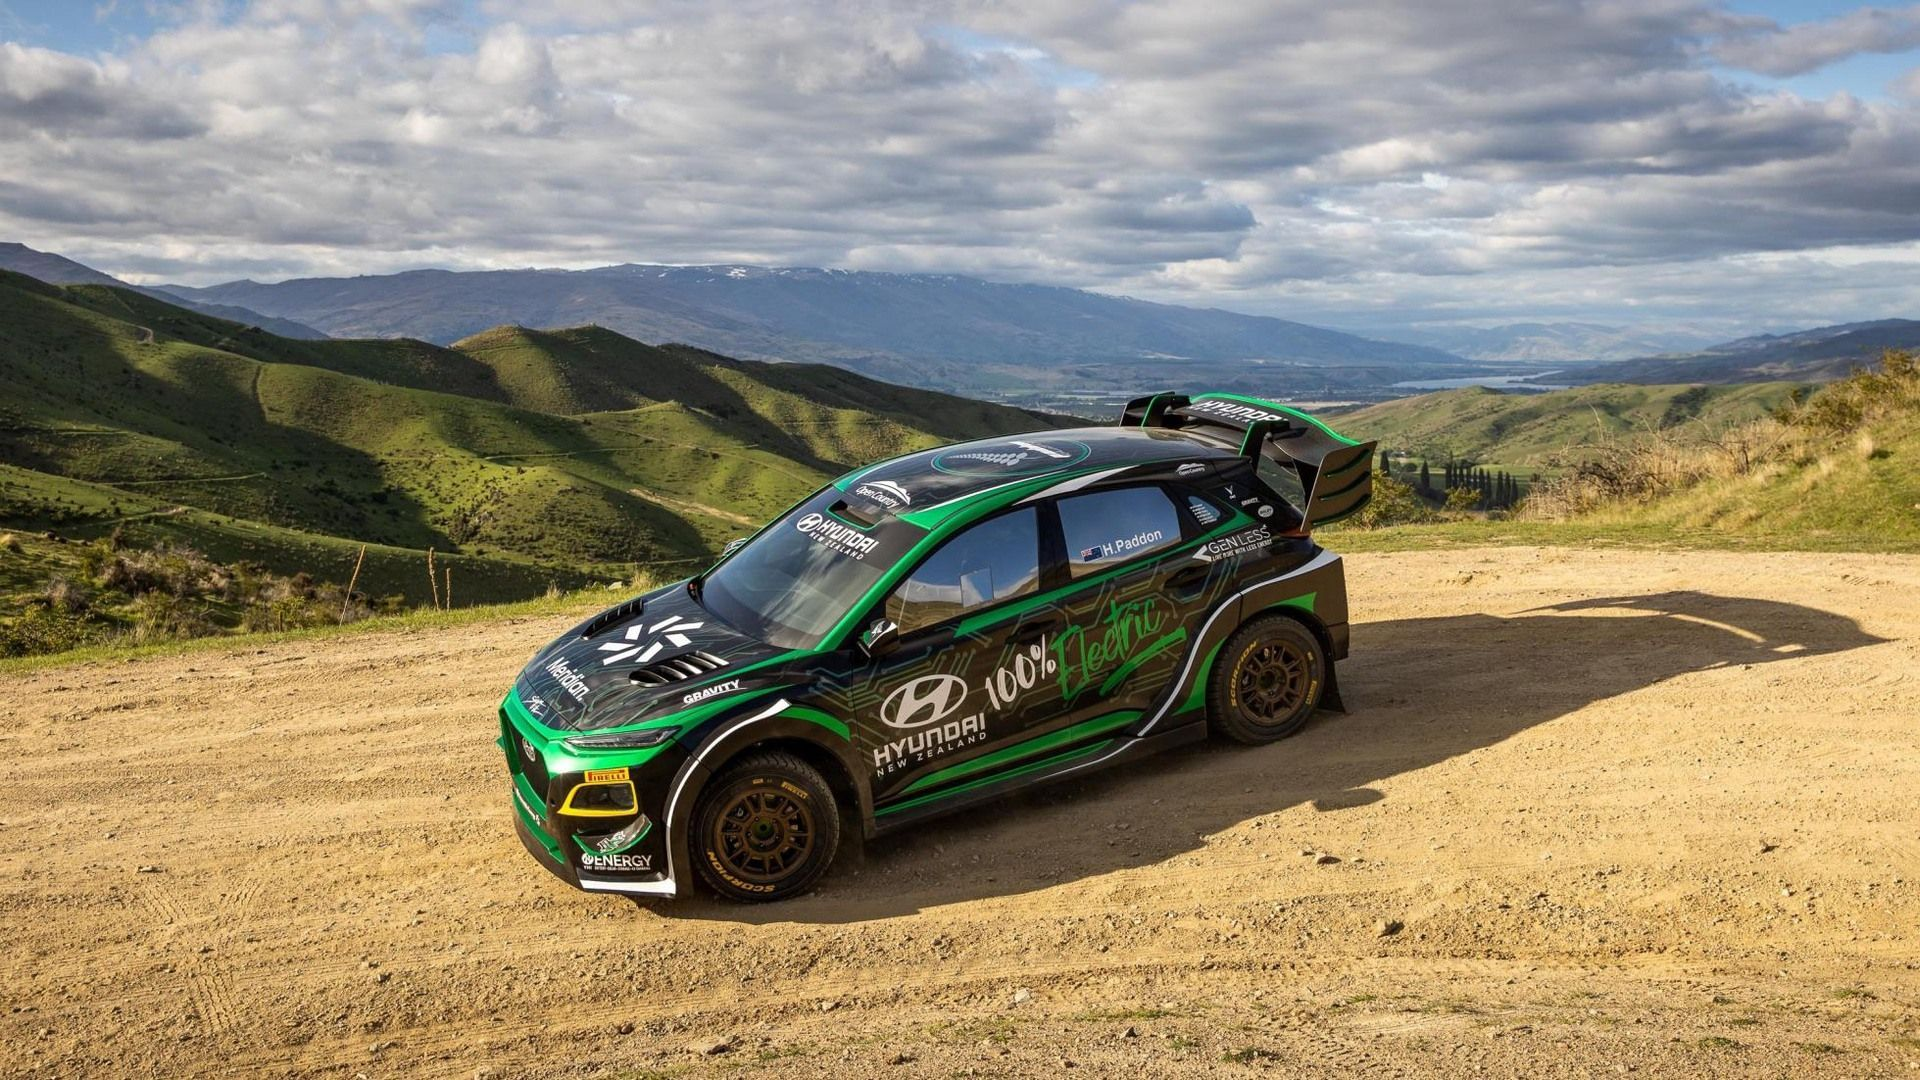 Hyundai_EV_rally_car_0008